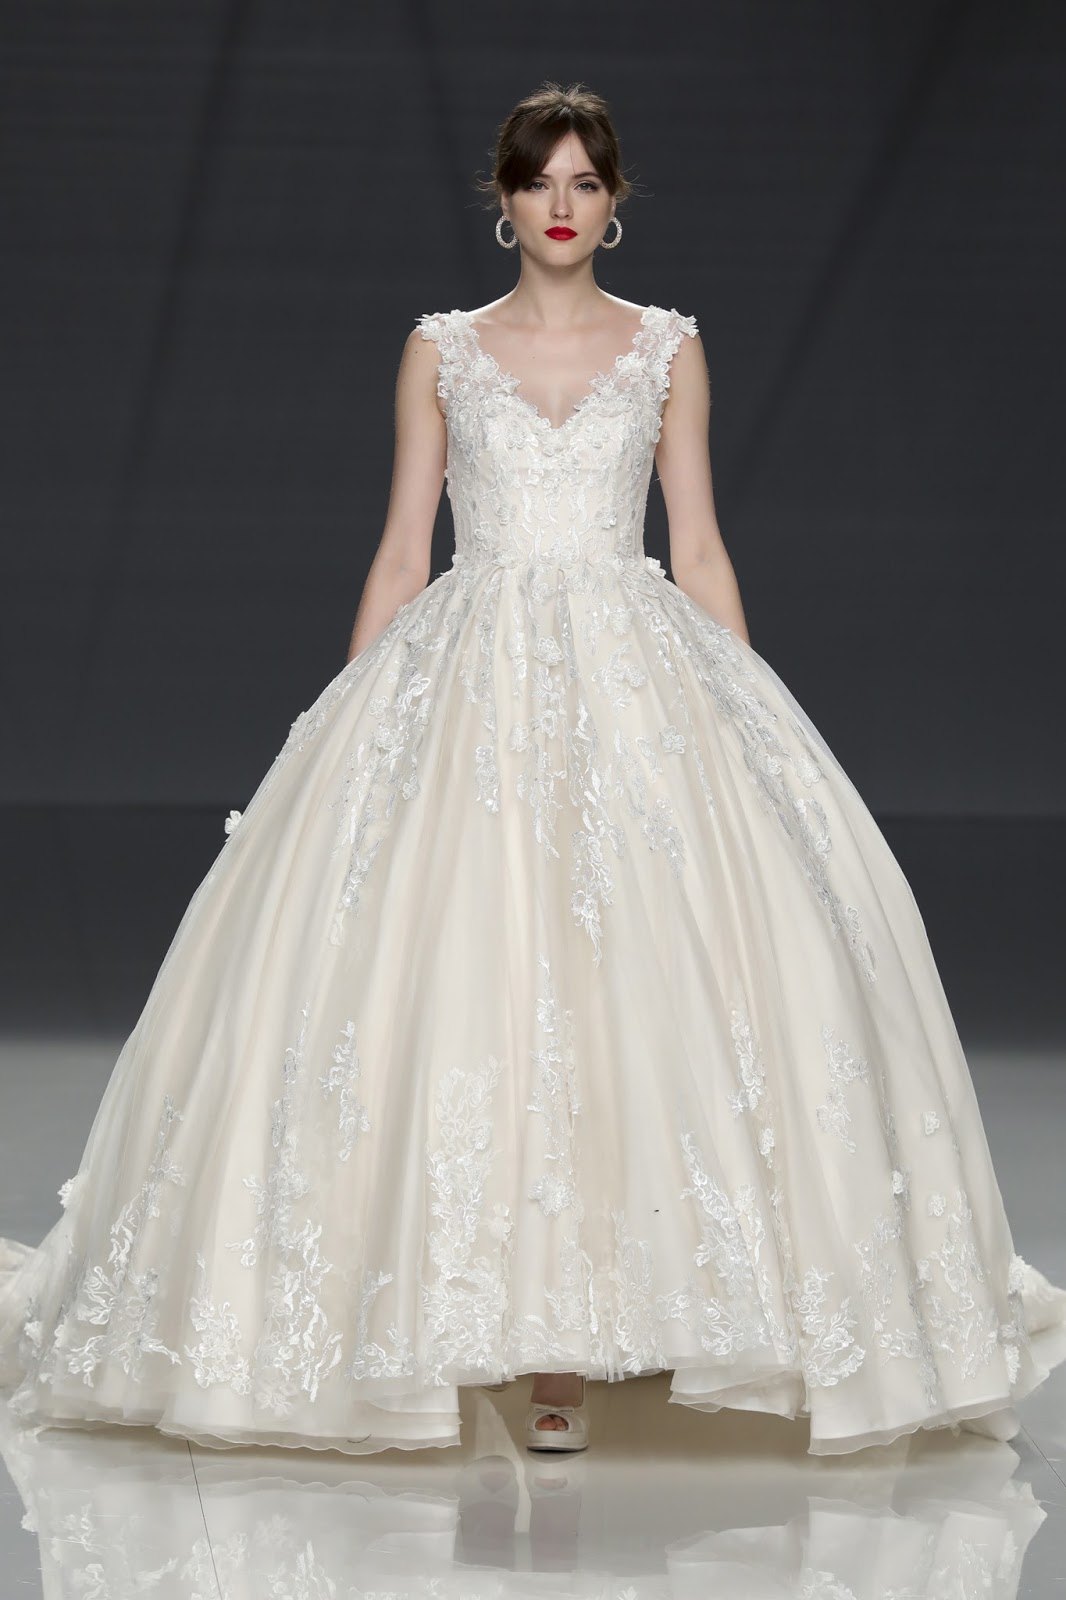 Demetrios Wedding Dress Prices 10 New DEMETRIOS SPRING BRIDAL COLLECTION